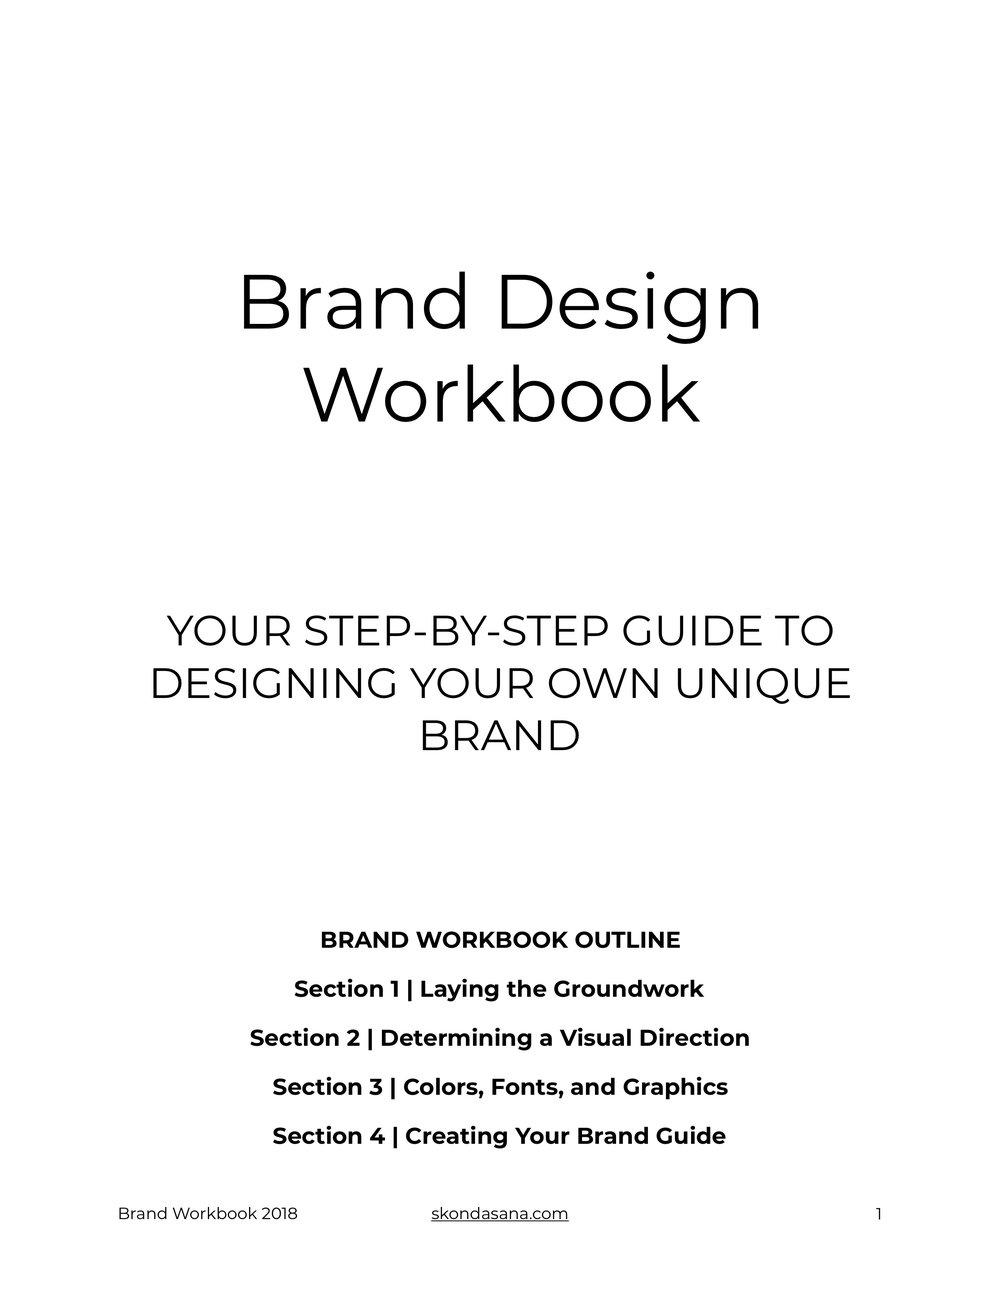 Brand Design Workbook c. 2018.jpg